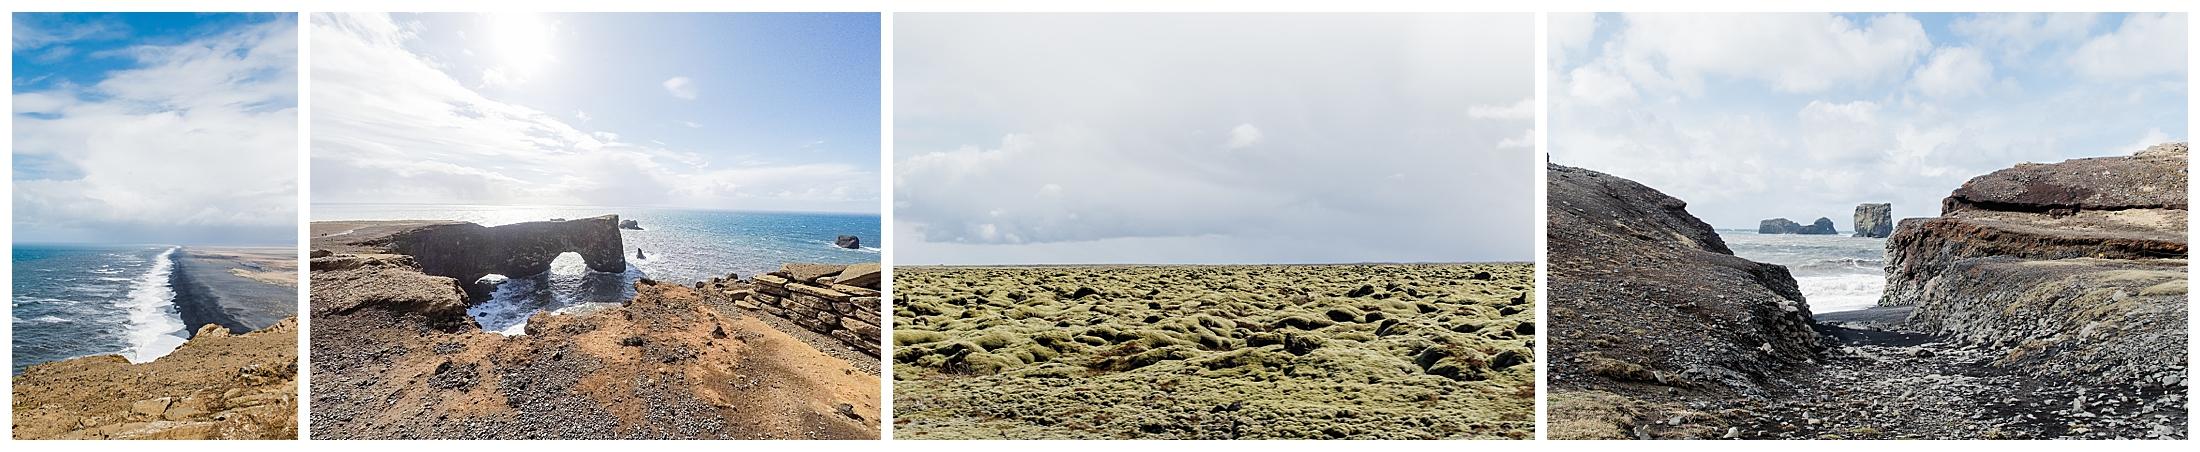 Iceland-Travel-Itinerary-5.jpg